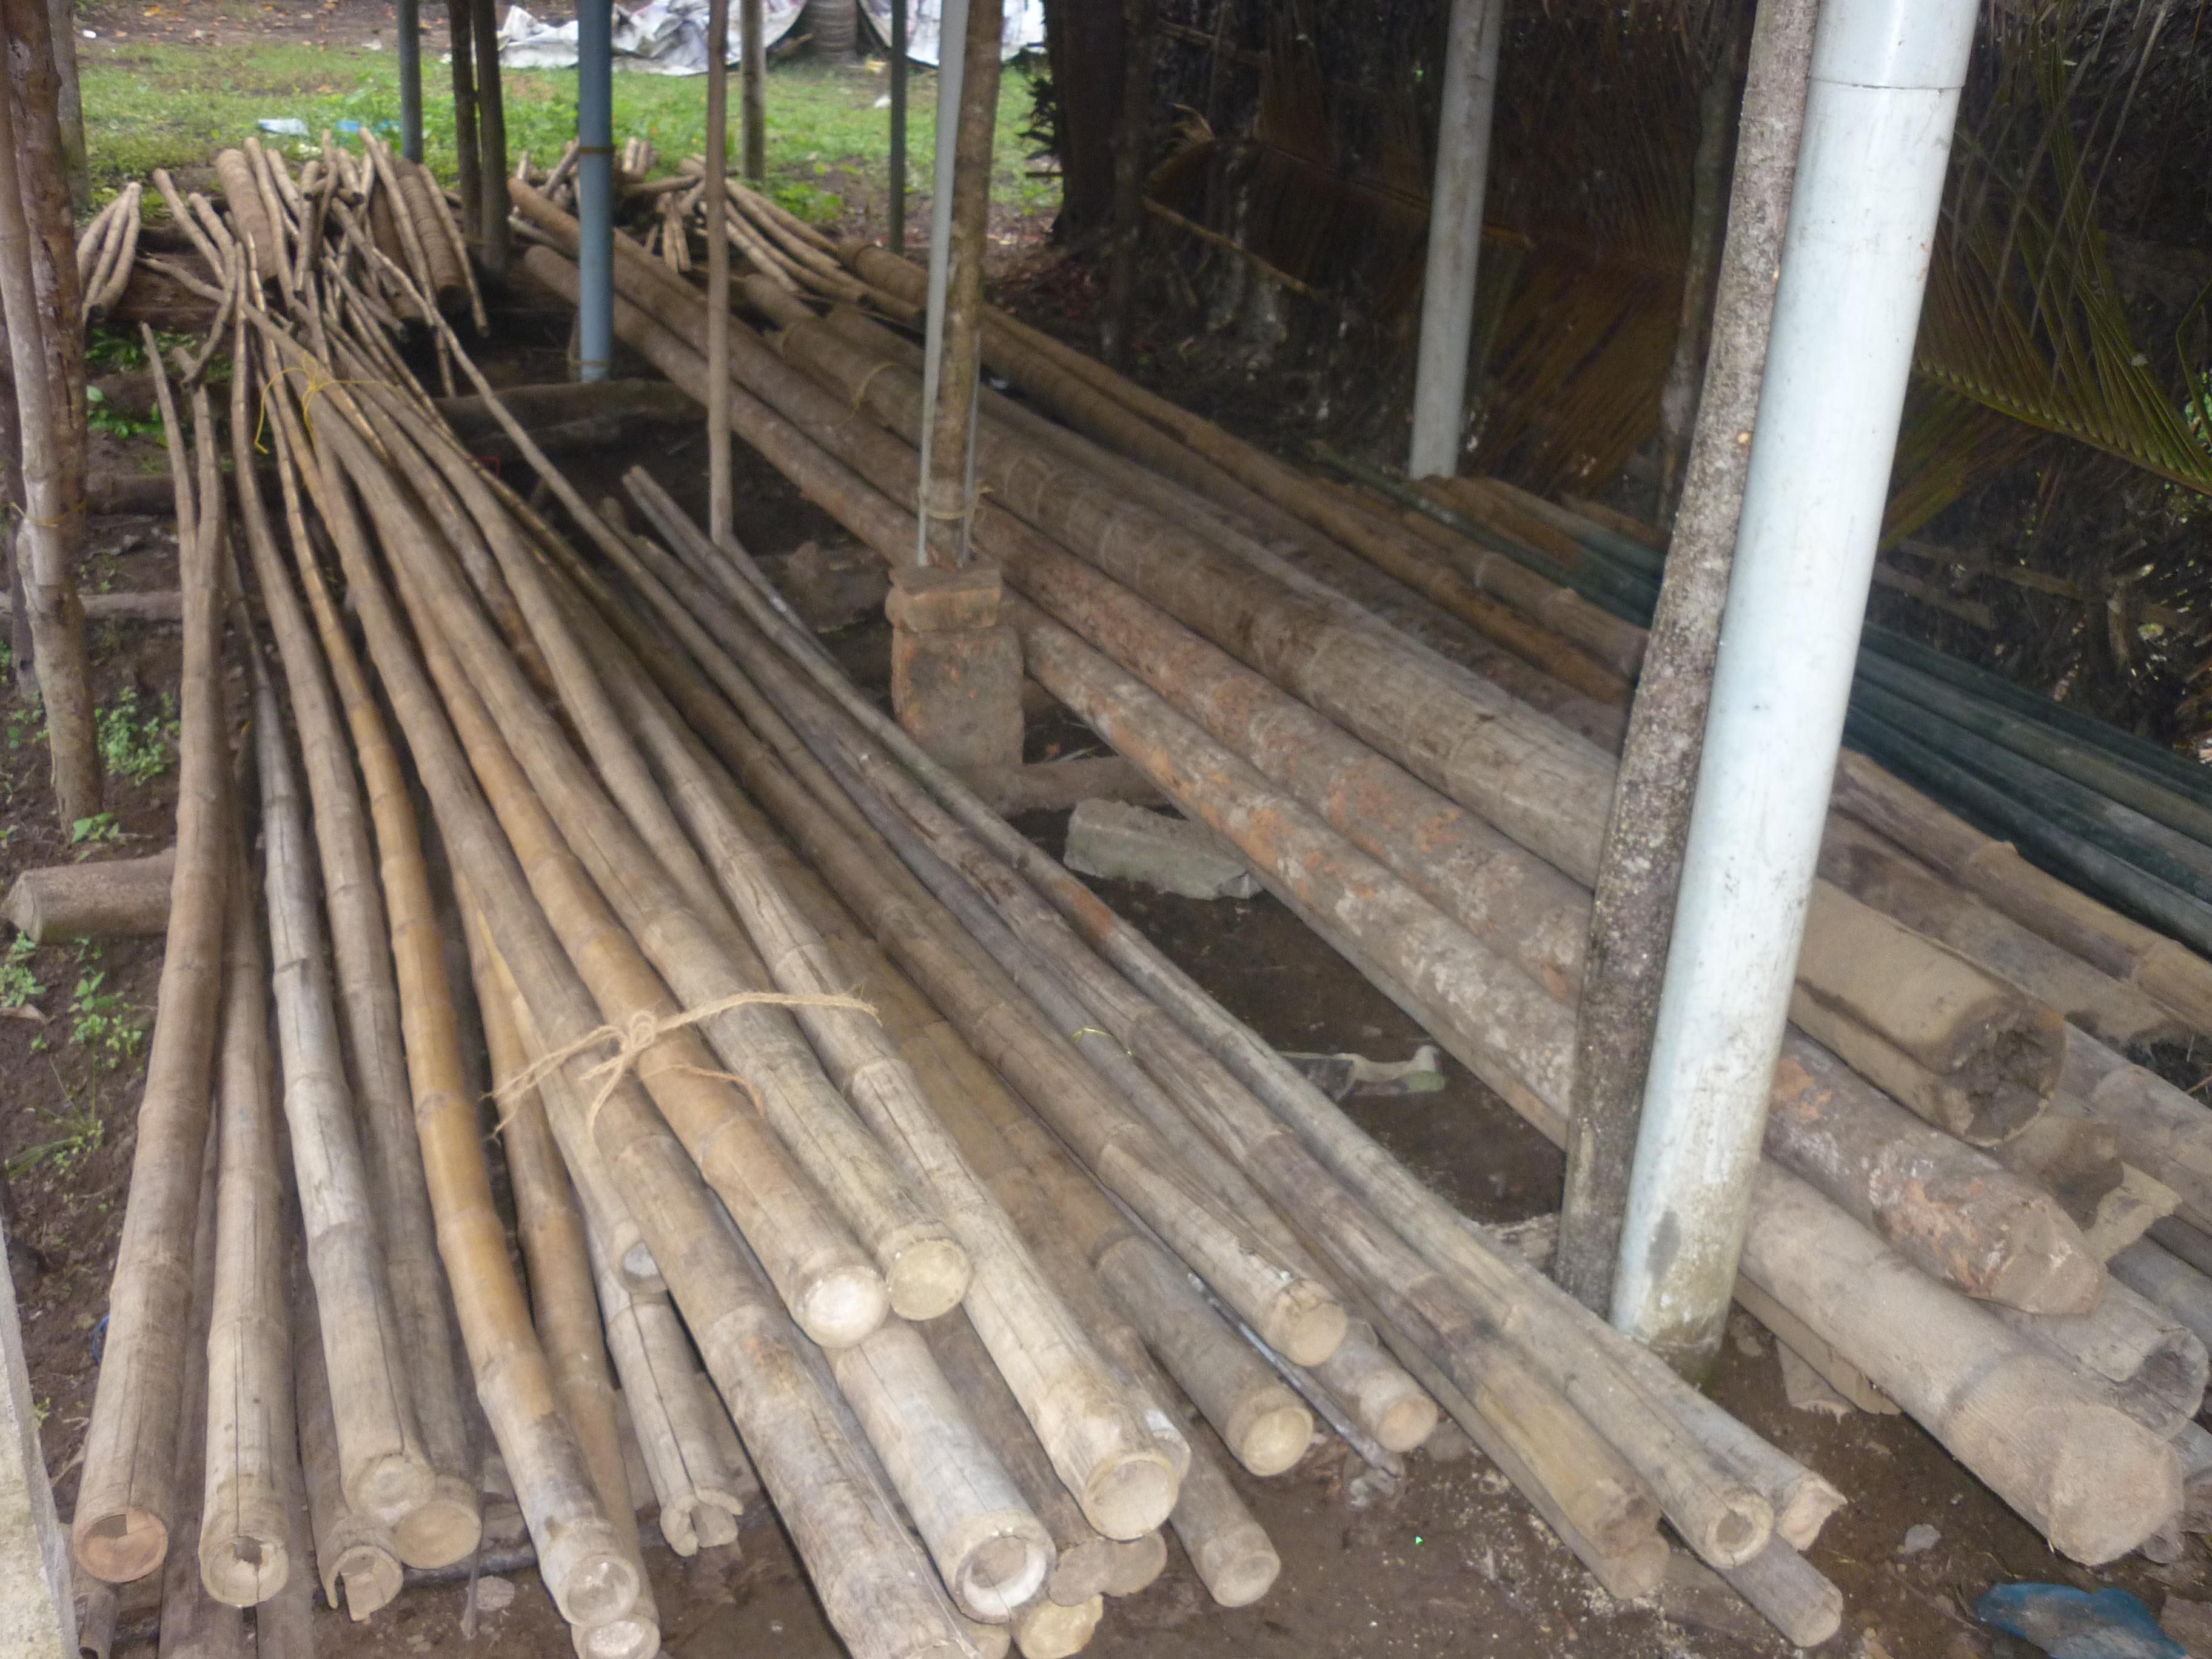 sex in schongau bambus foltermethode